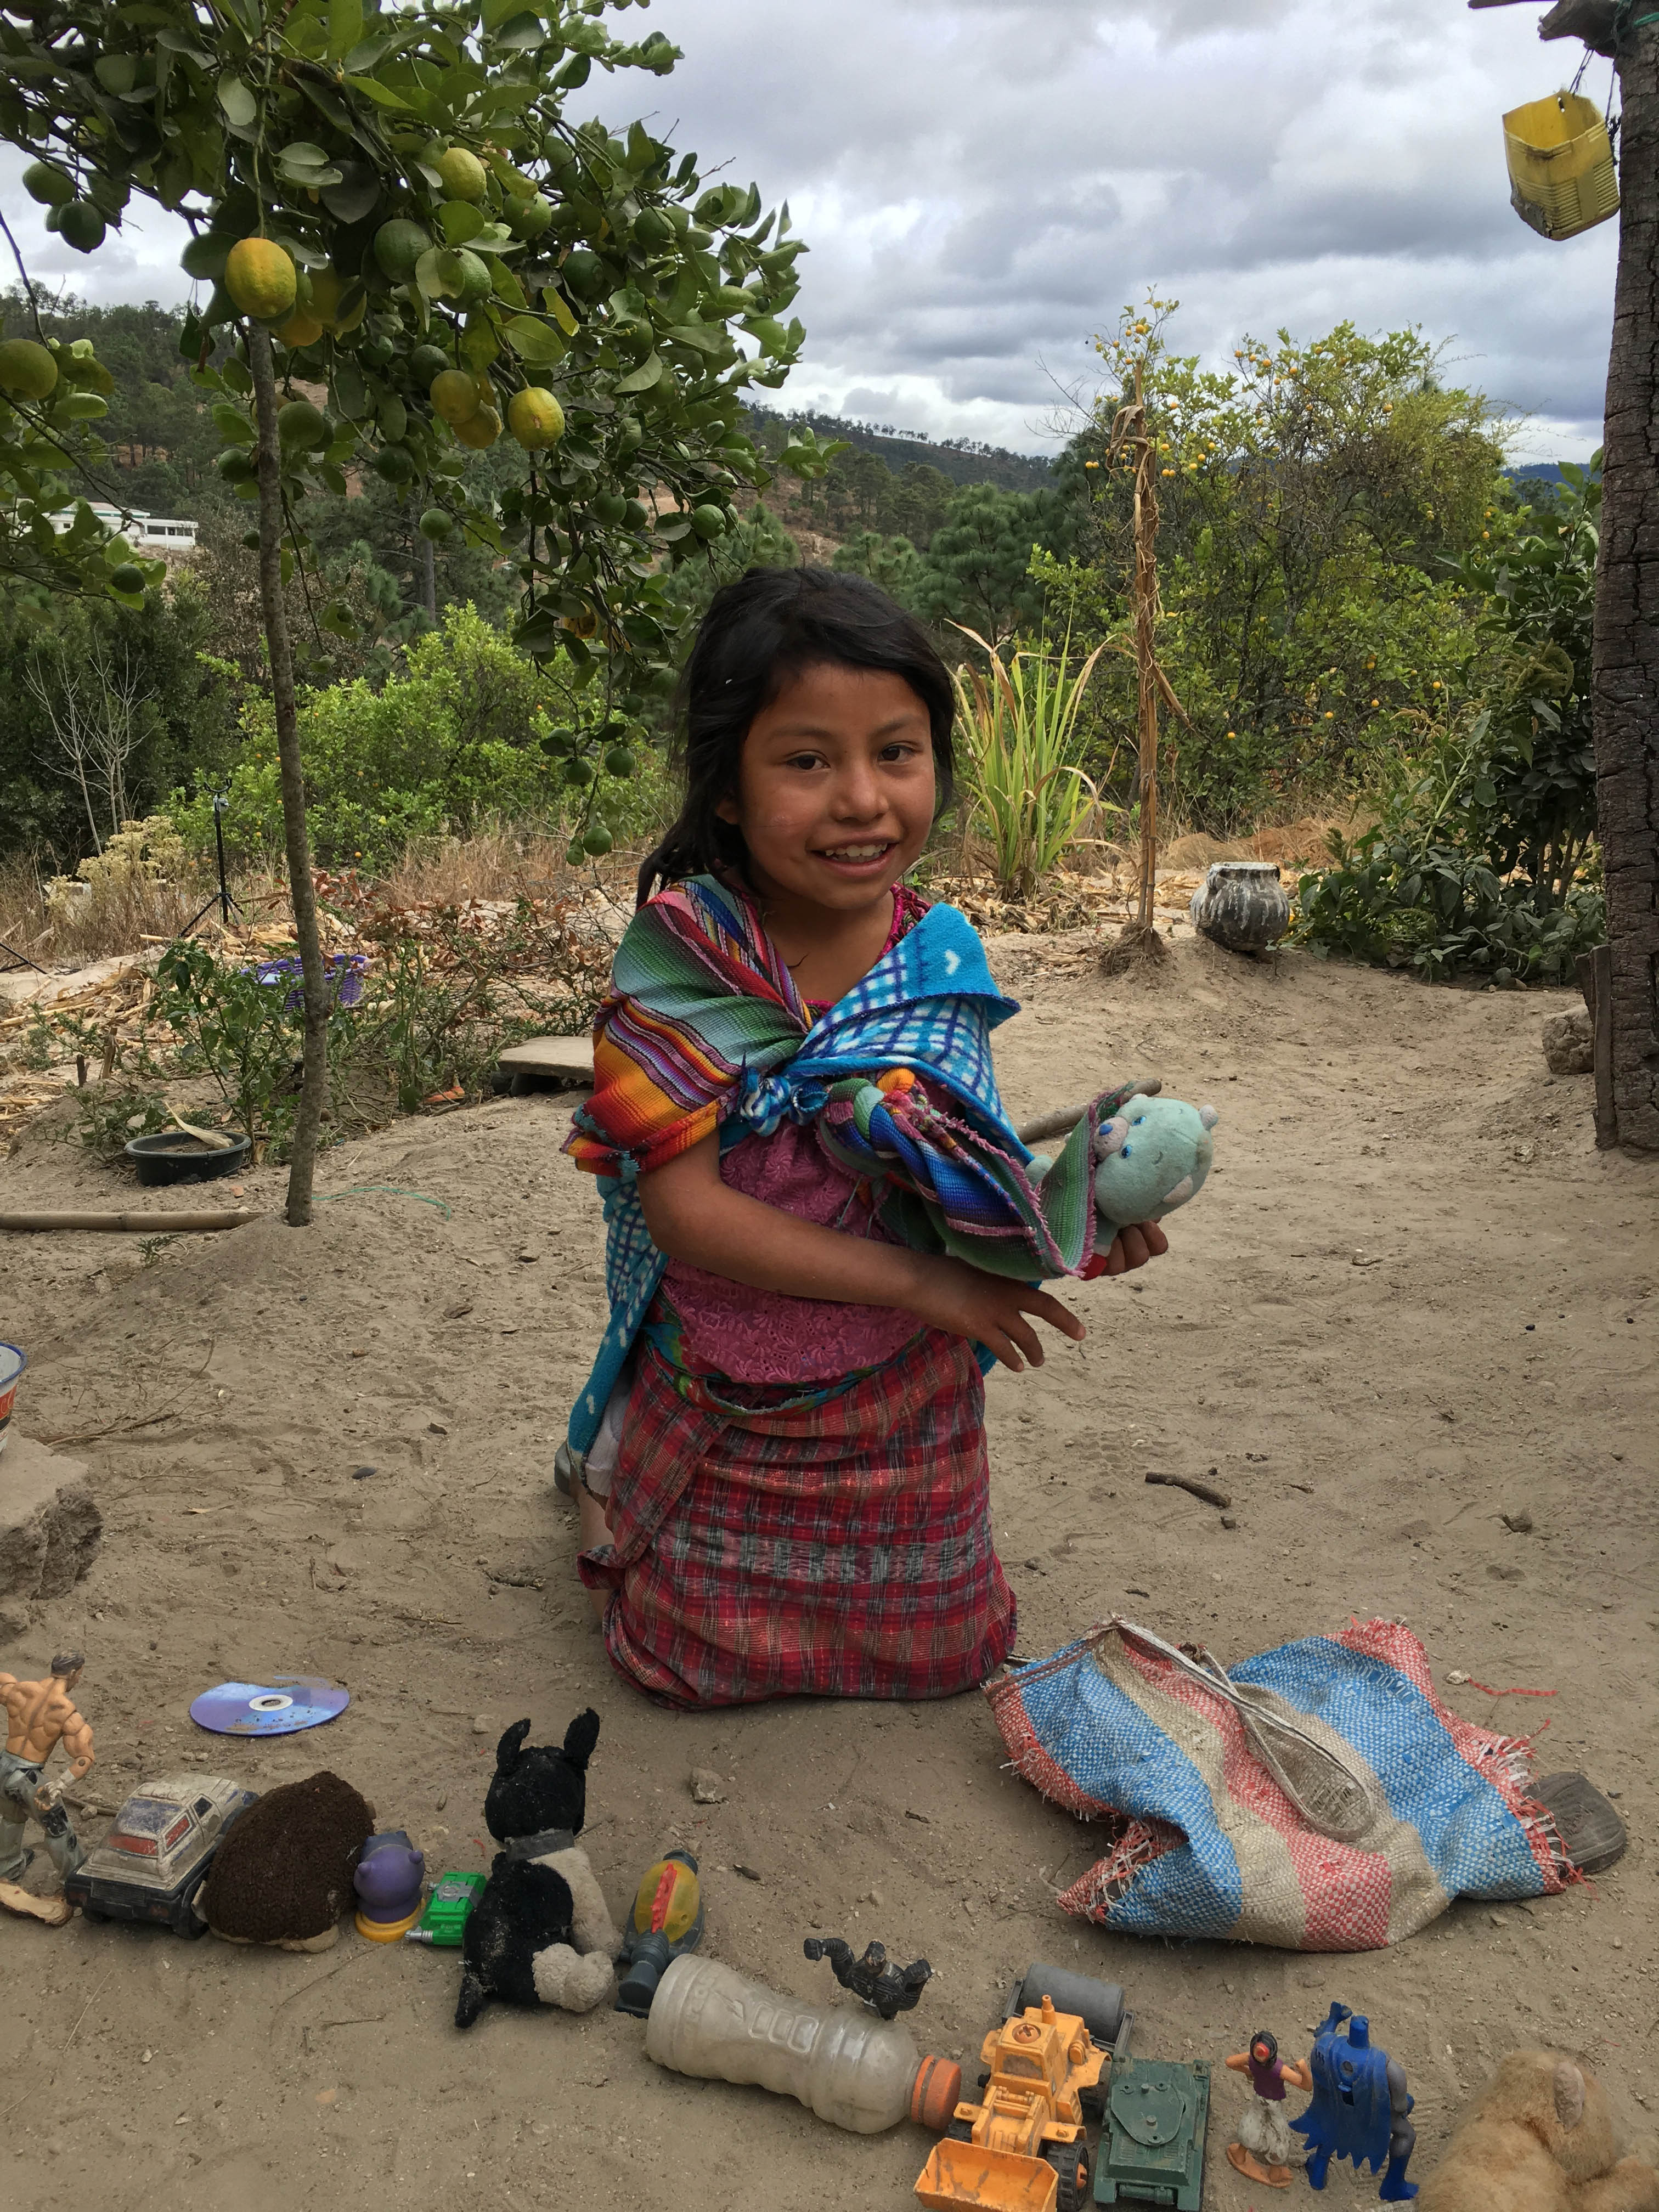 Gautemala-Mayan-girl-and-her-favorite-toys